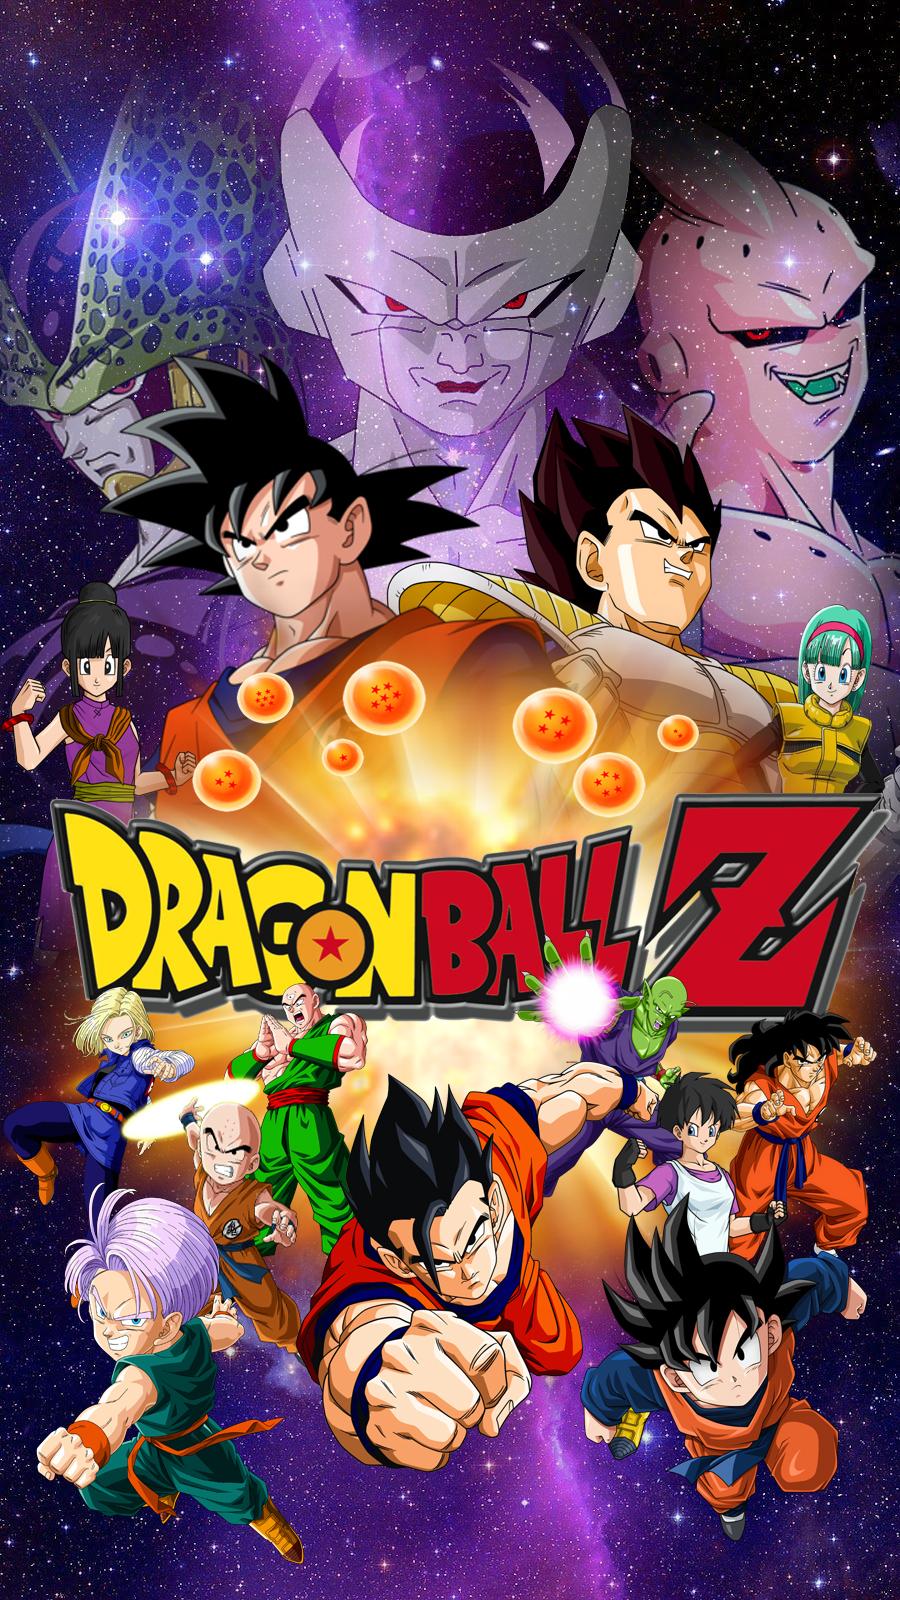 Dragon Ball Z Iphone Wallpaper Hd By Joshua121penalba On Deviantart